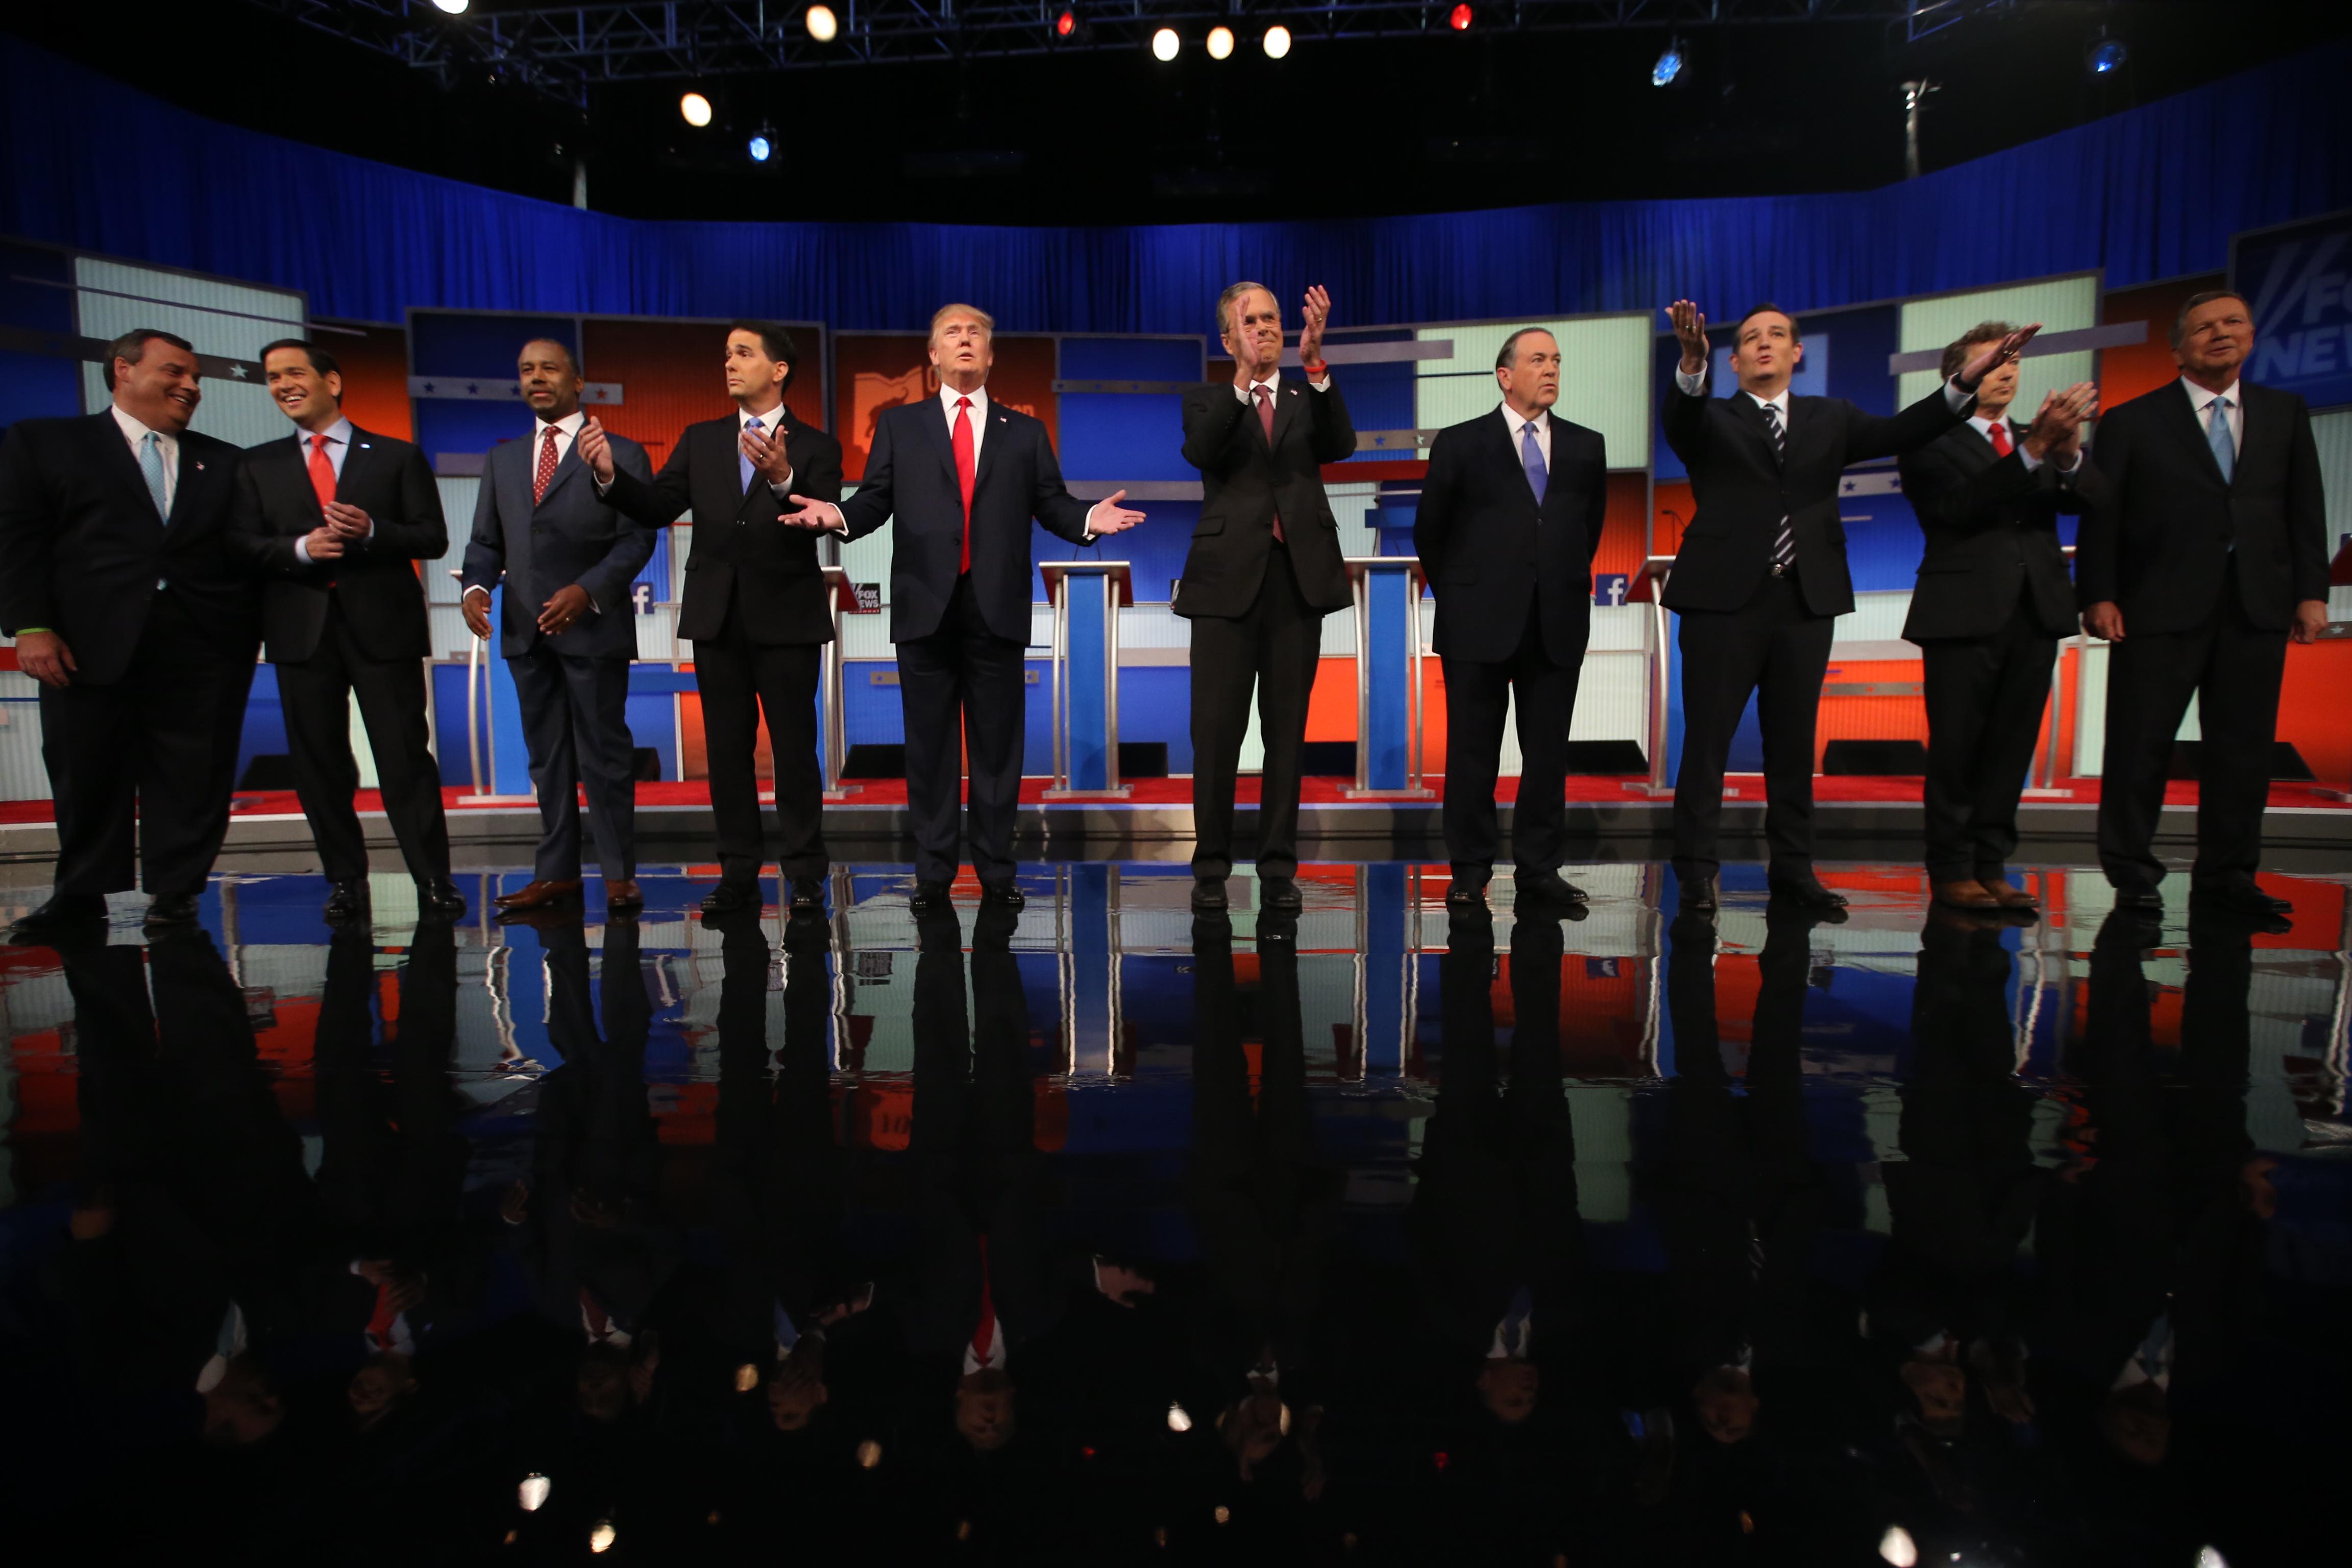 Chris Christie, Marco Rubio, Ben Carson, Scott Walker, Donald Trump, Jeb Bush, Mike Huckabee, Ted Cruz, Rand Paul, John Kasich